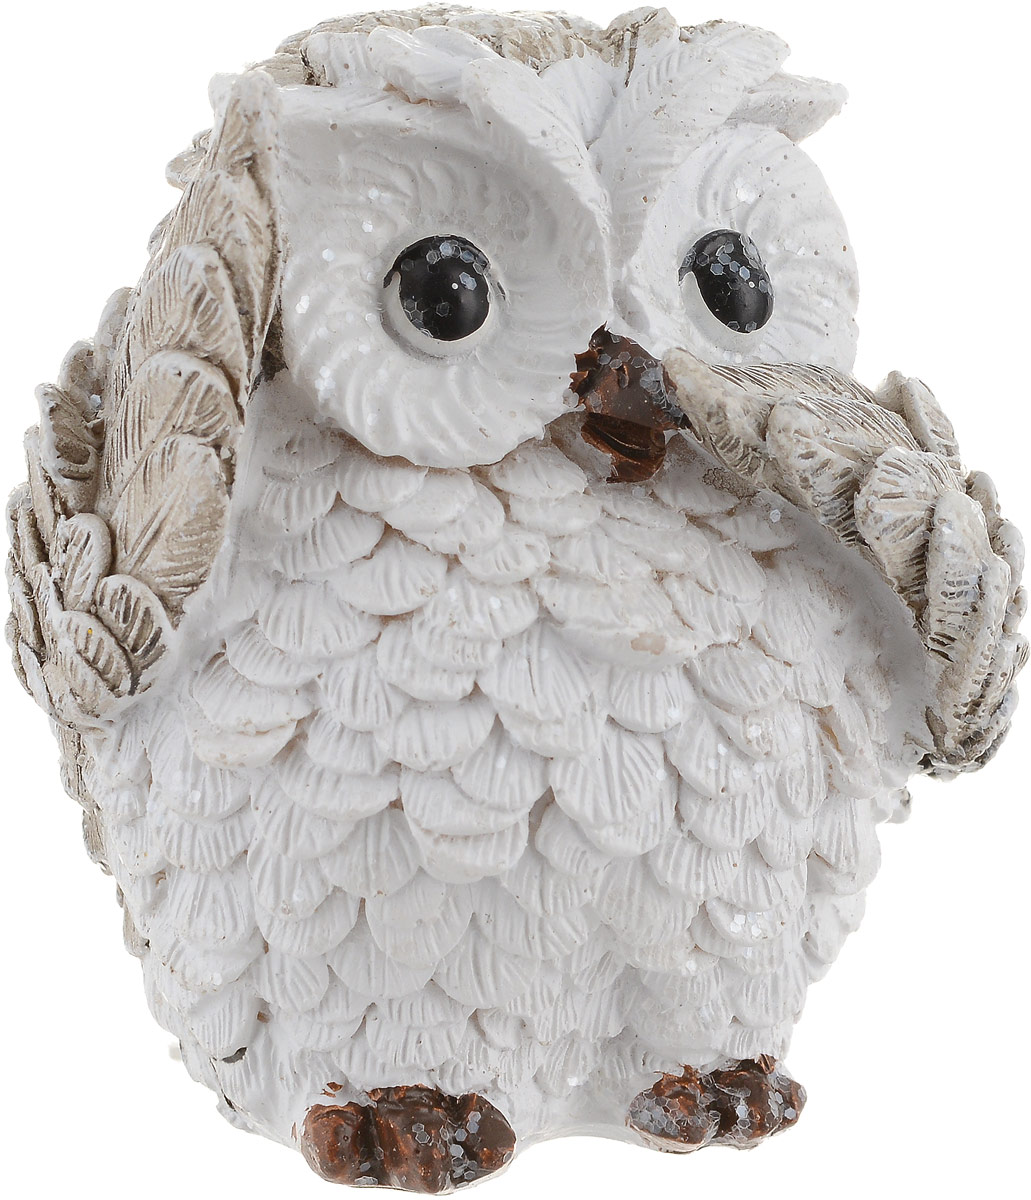 Фигурка декоративная Феникс-Презент Милая сова, высота 6,5 см. 75655 ваза декоративная феникс презент высота 13 5 см 43822